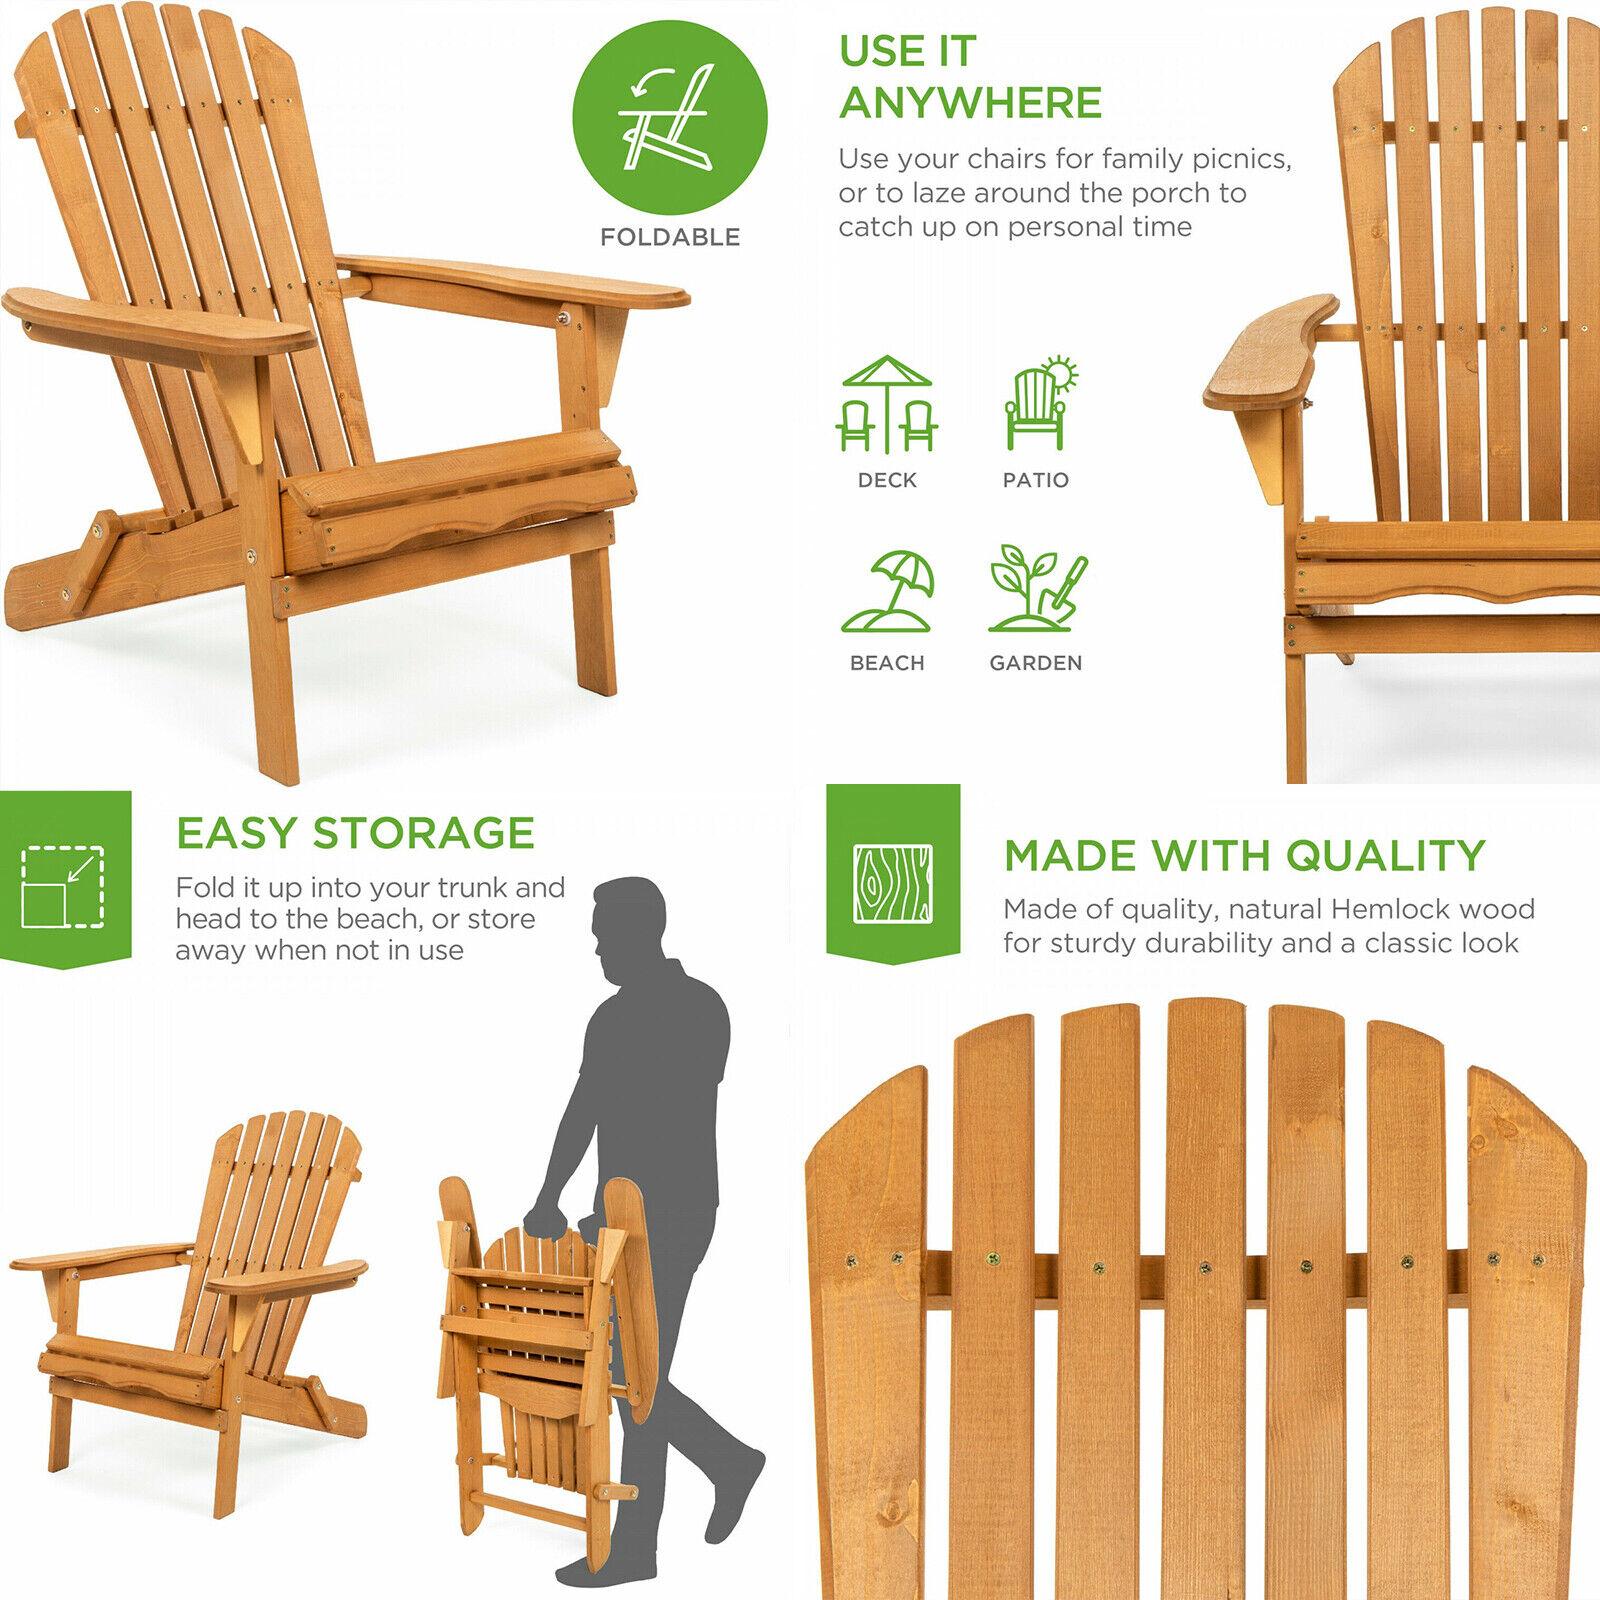 Burgundy Red Deck Chair W Black Frame Recliner Seat Folding Outdoor Furniture For Sale Online Ebay